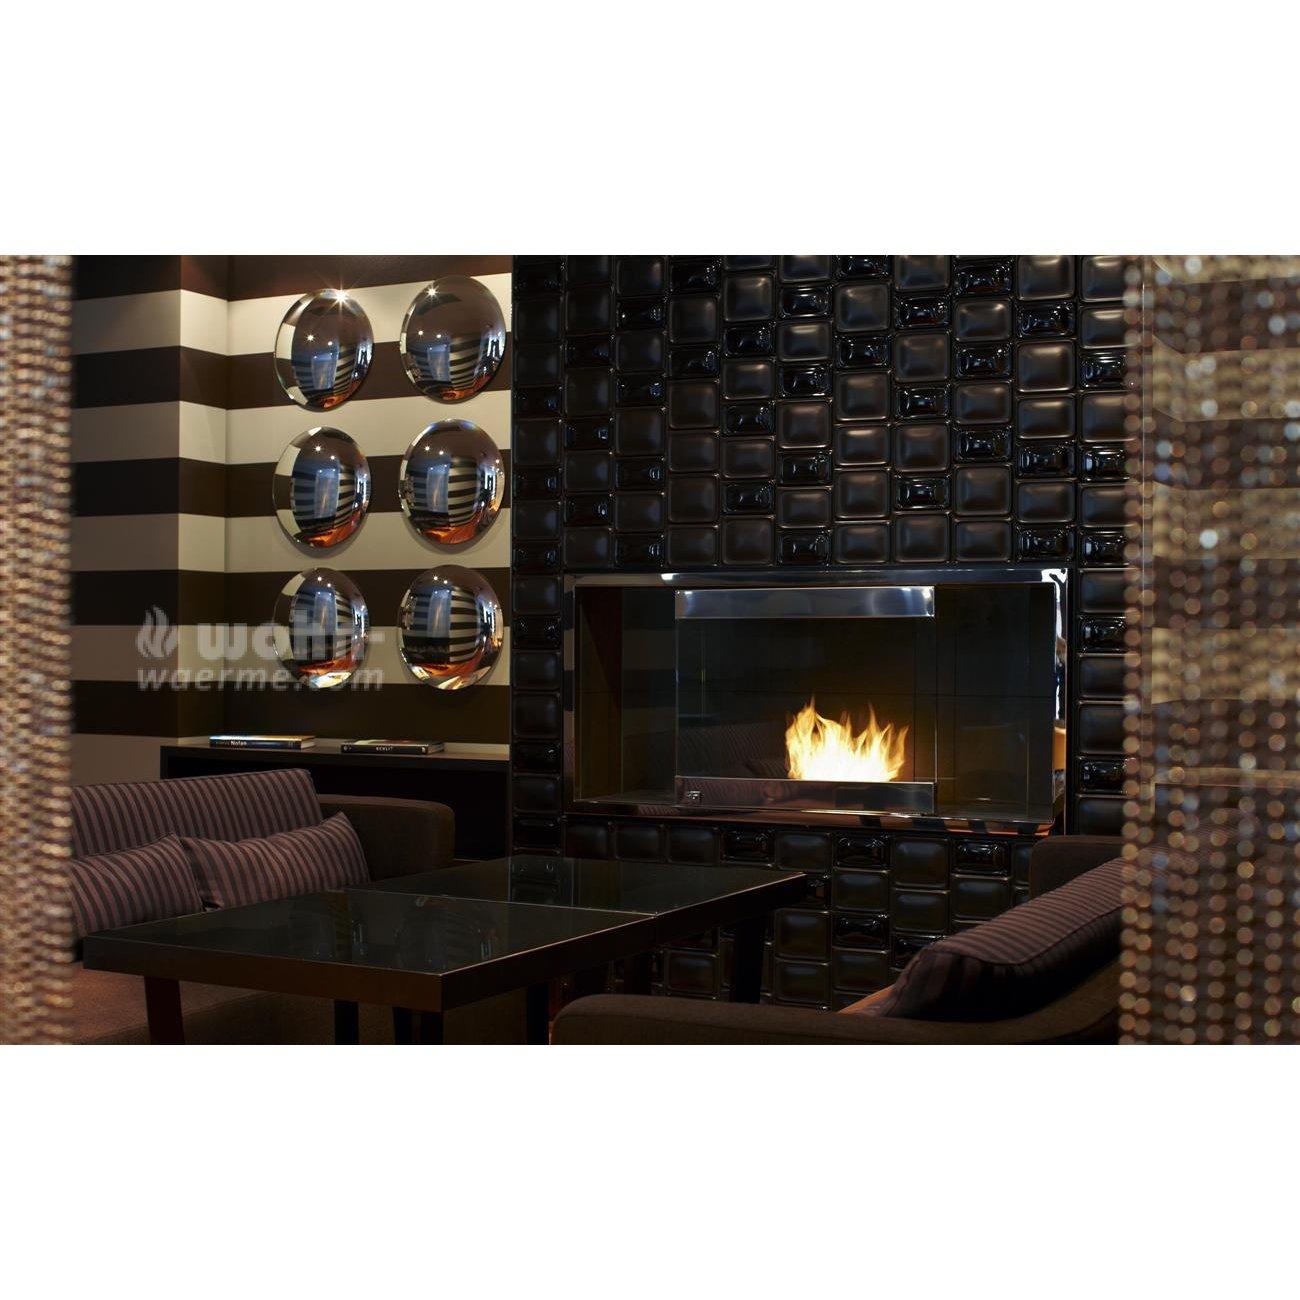 quadratischer ethanol brenner ecosmart bk serie. Black Bedroom Furniture Sets. Home Design Ideas